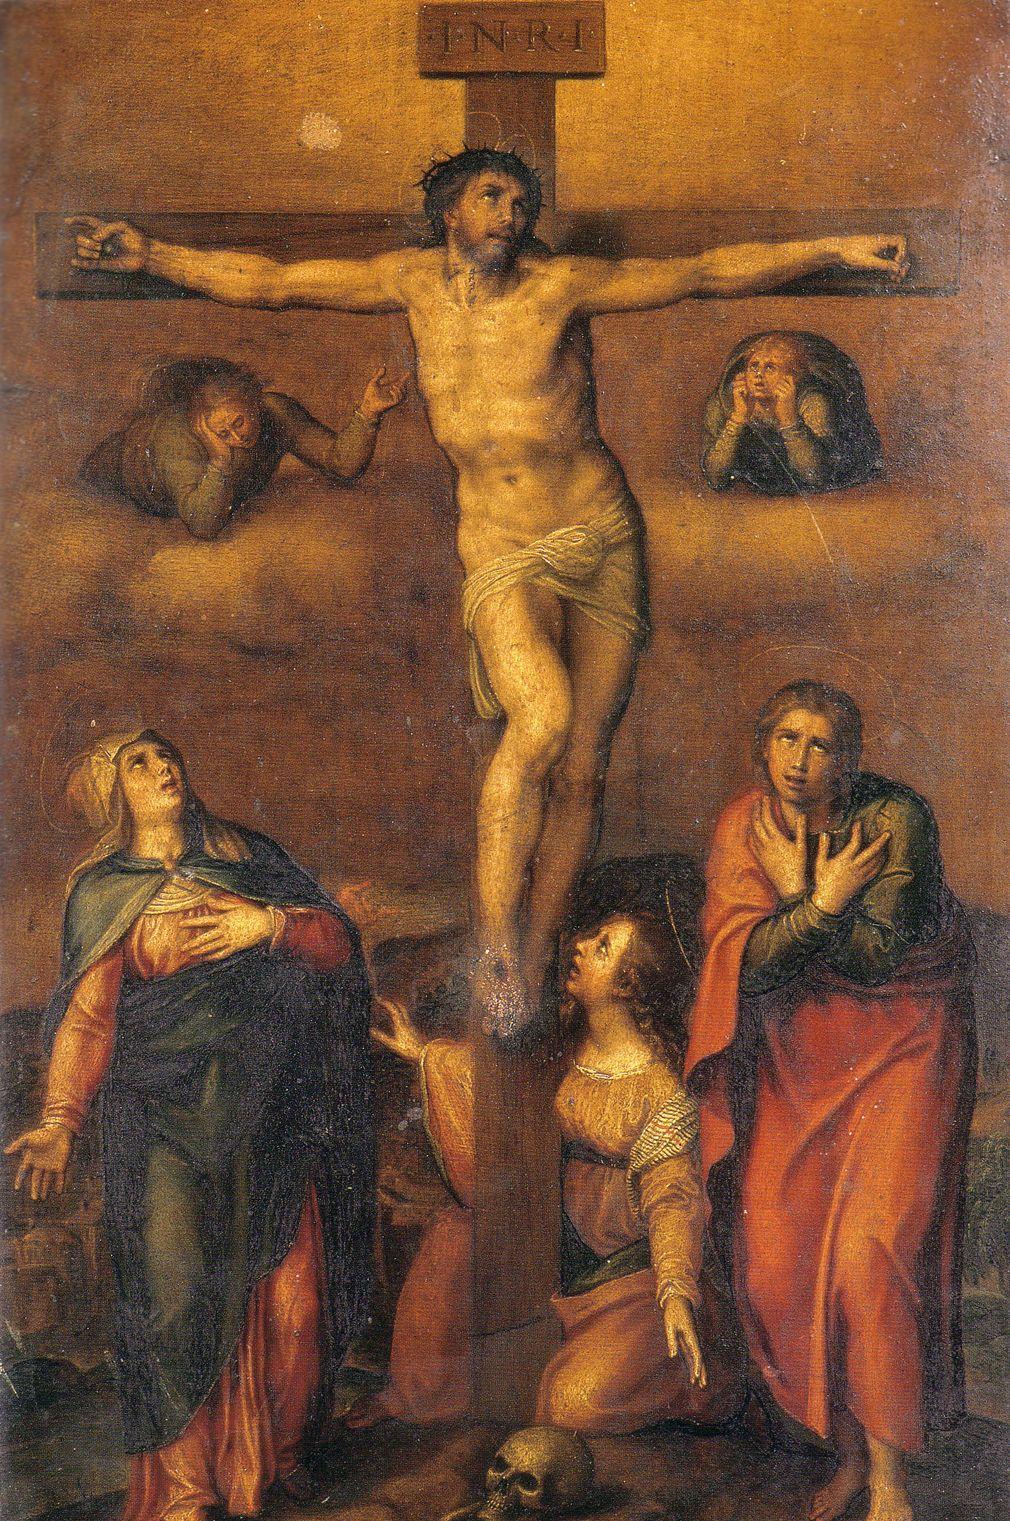 Jesus as a clitoris picture